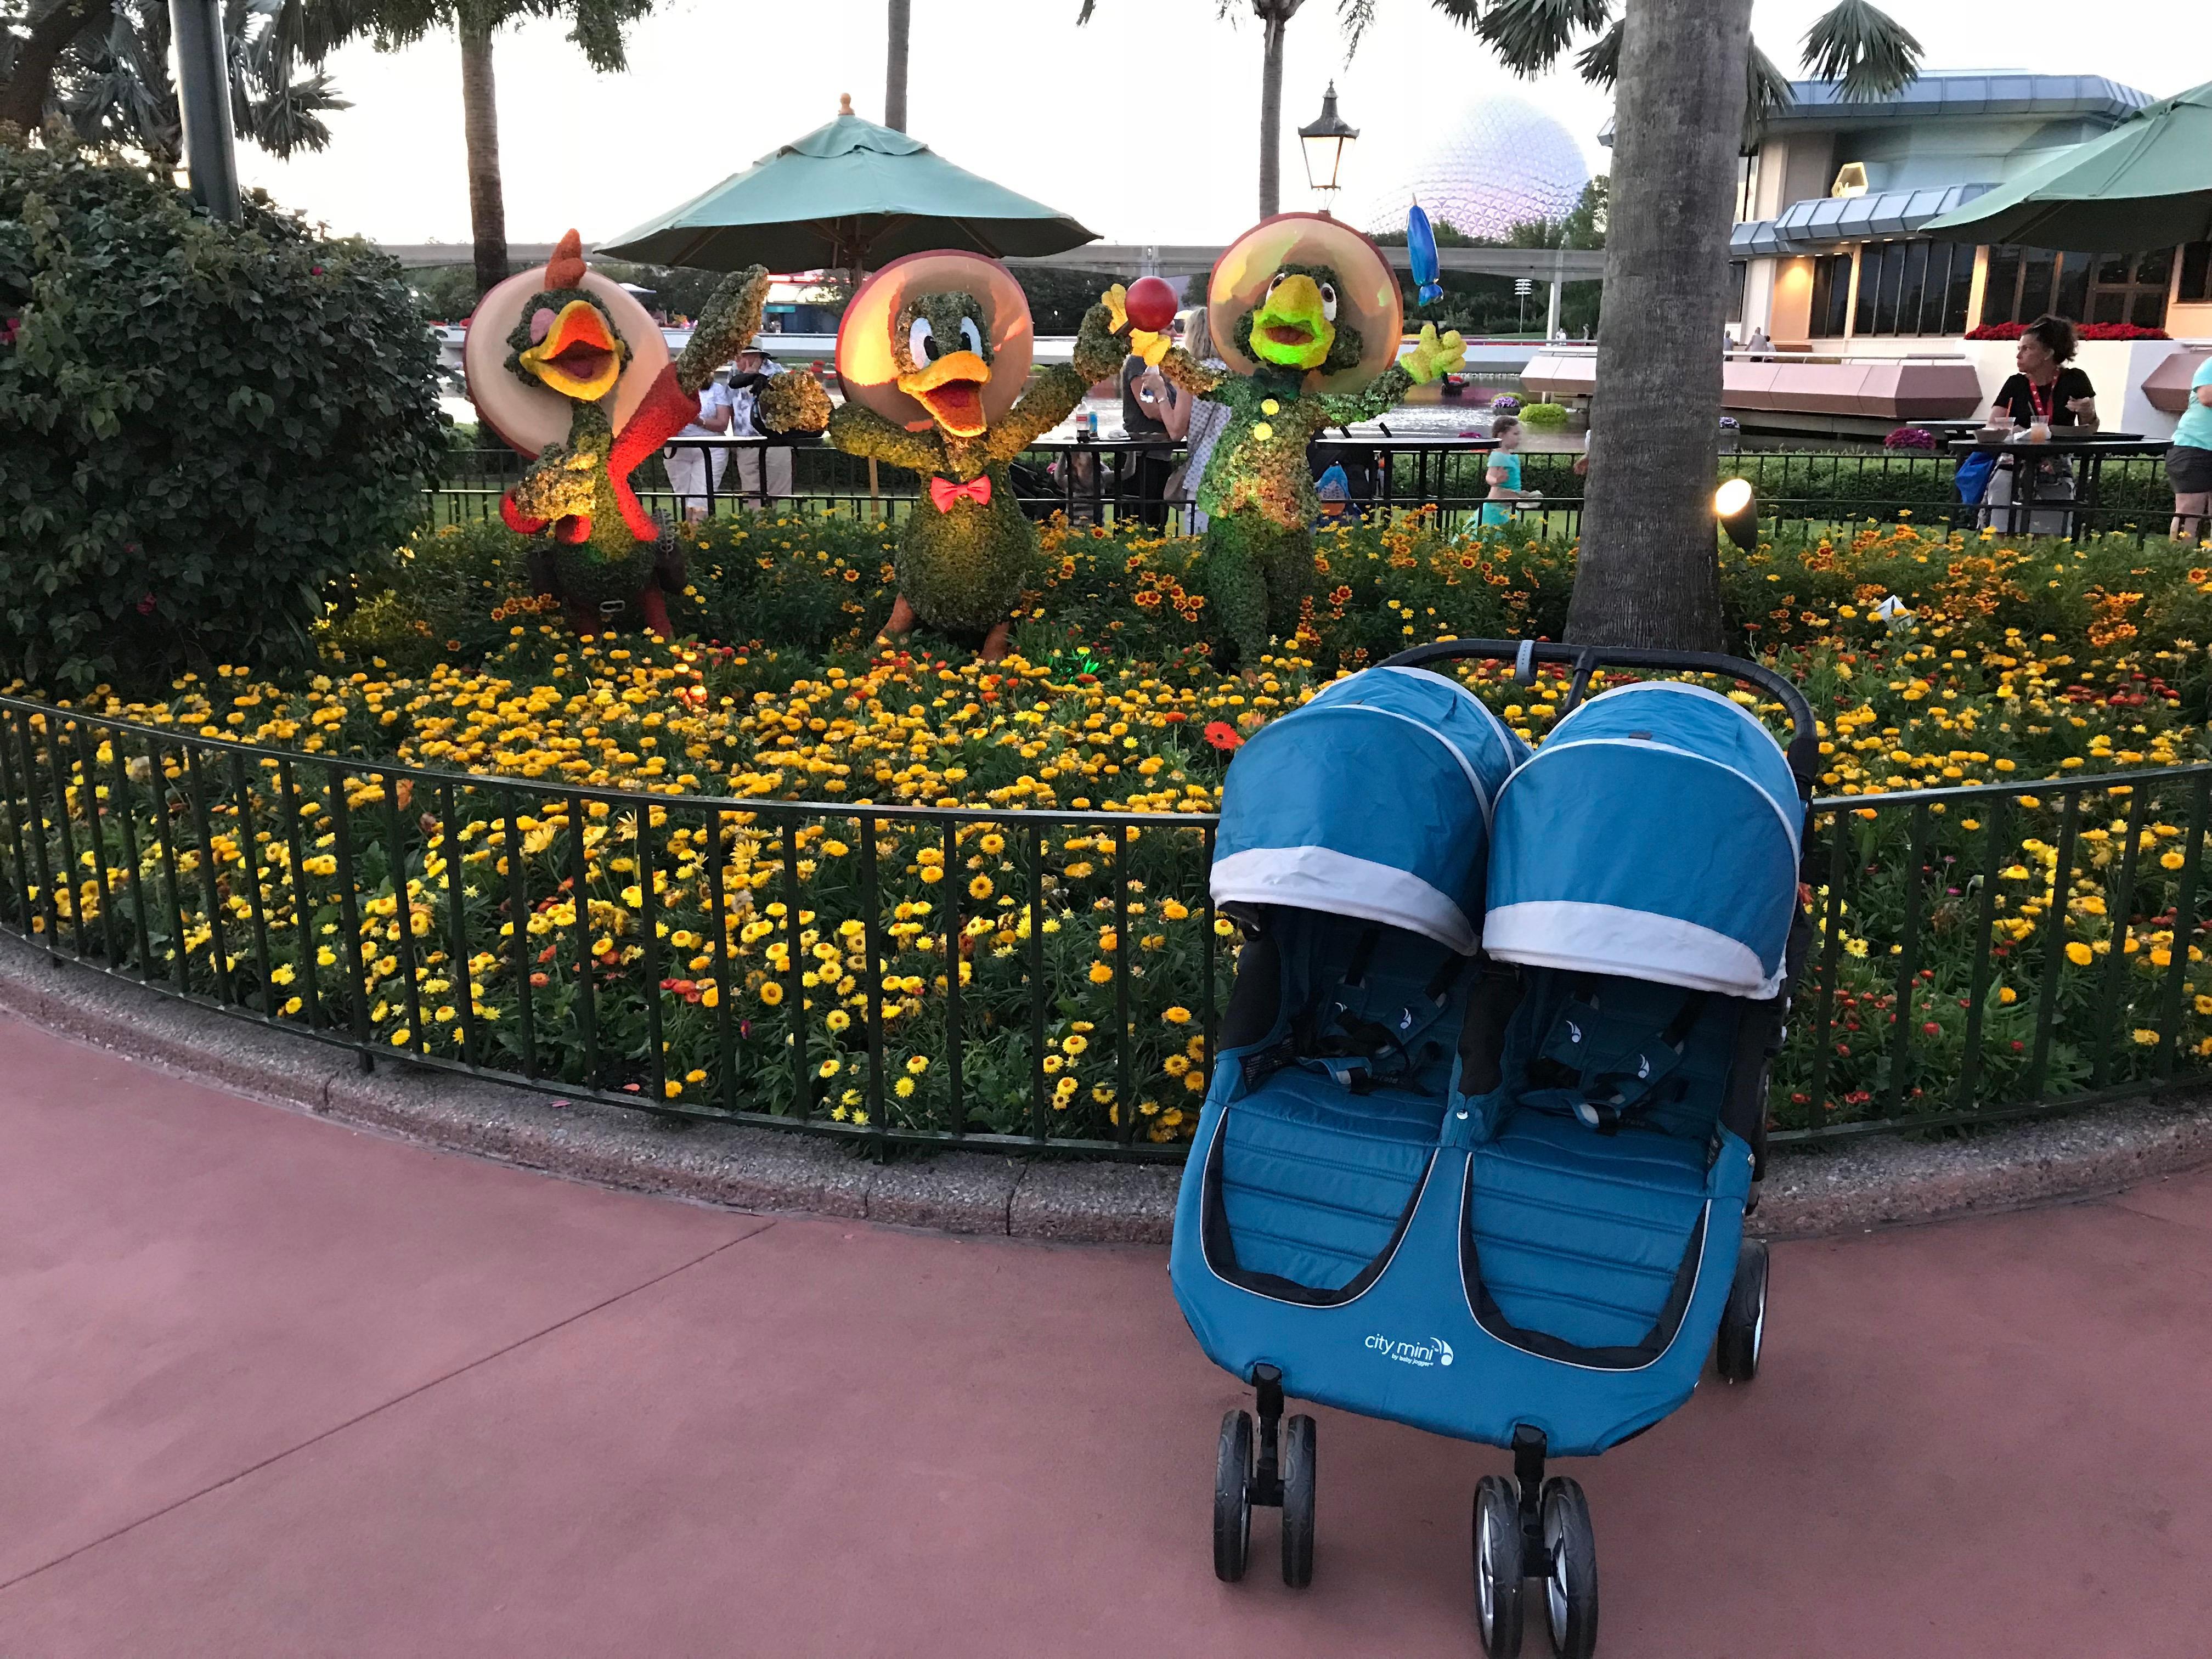 Stroller Rentals Disney image 39